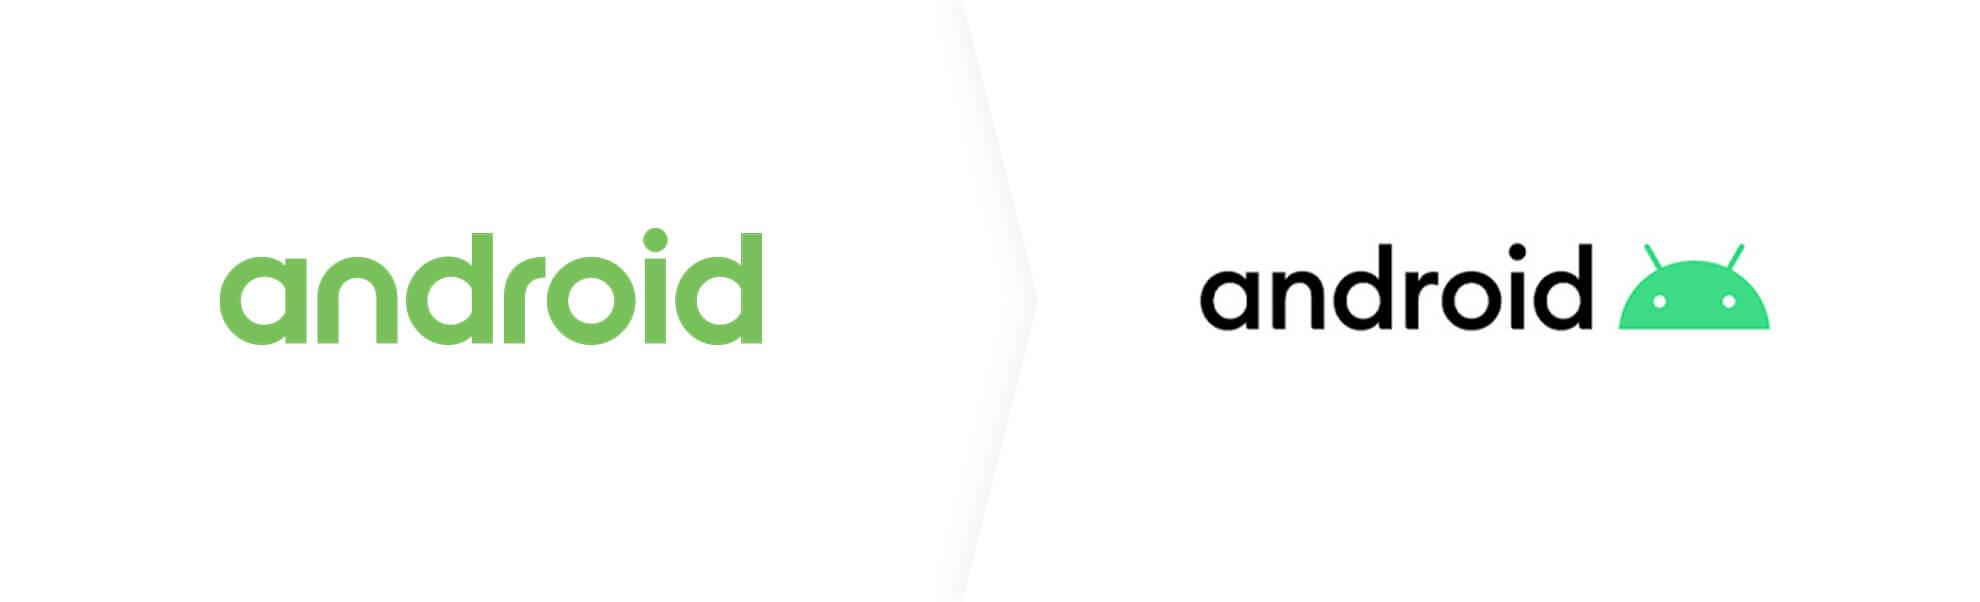 Stare i nowe logo androida